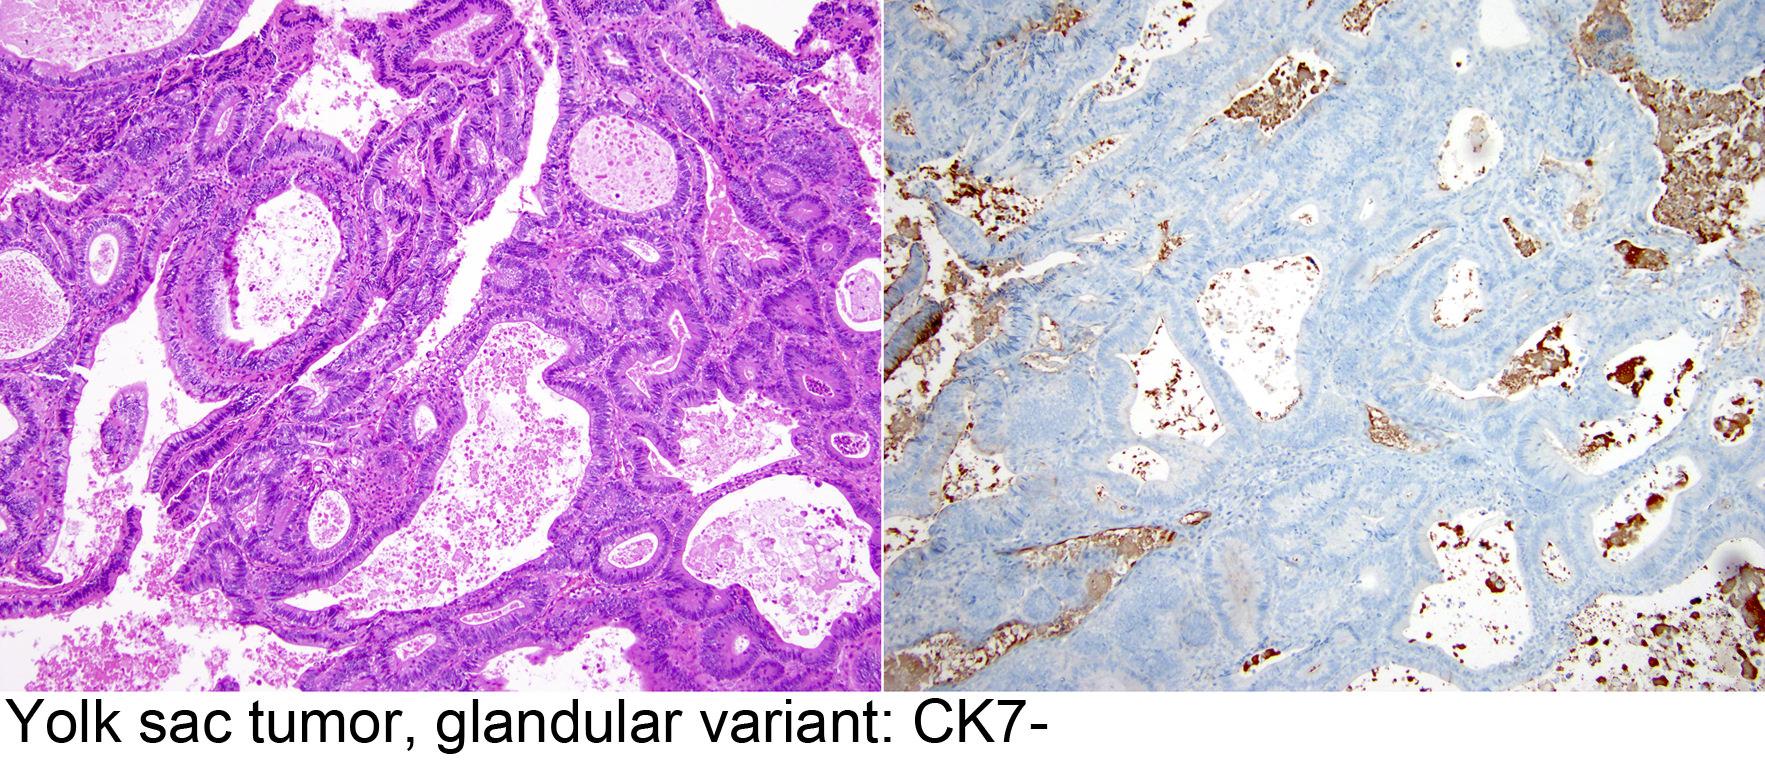 prostate adenocarcinoma ck7 positive)